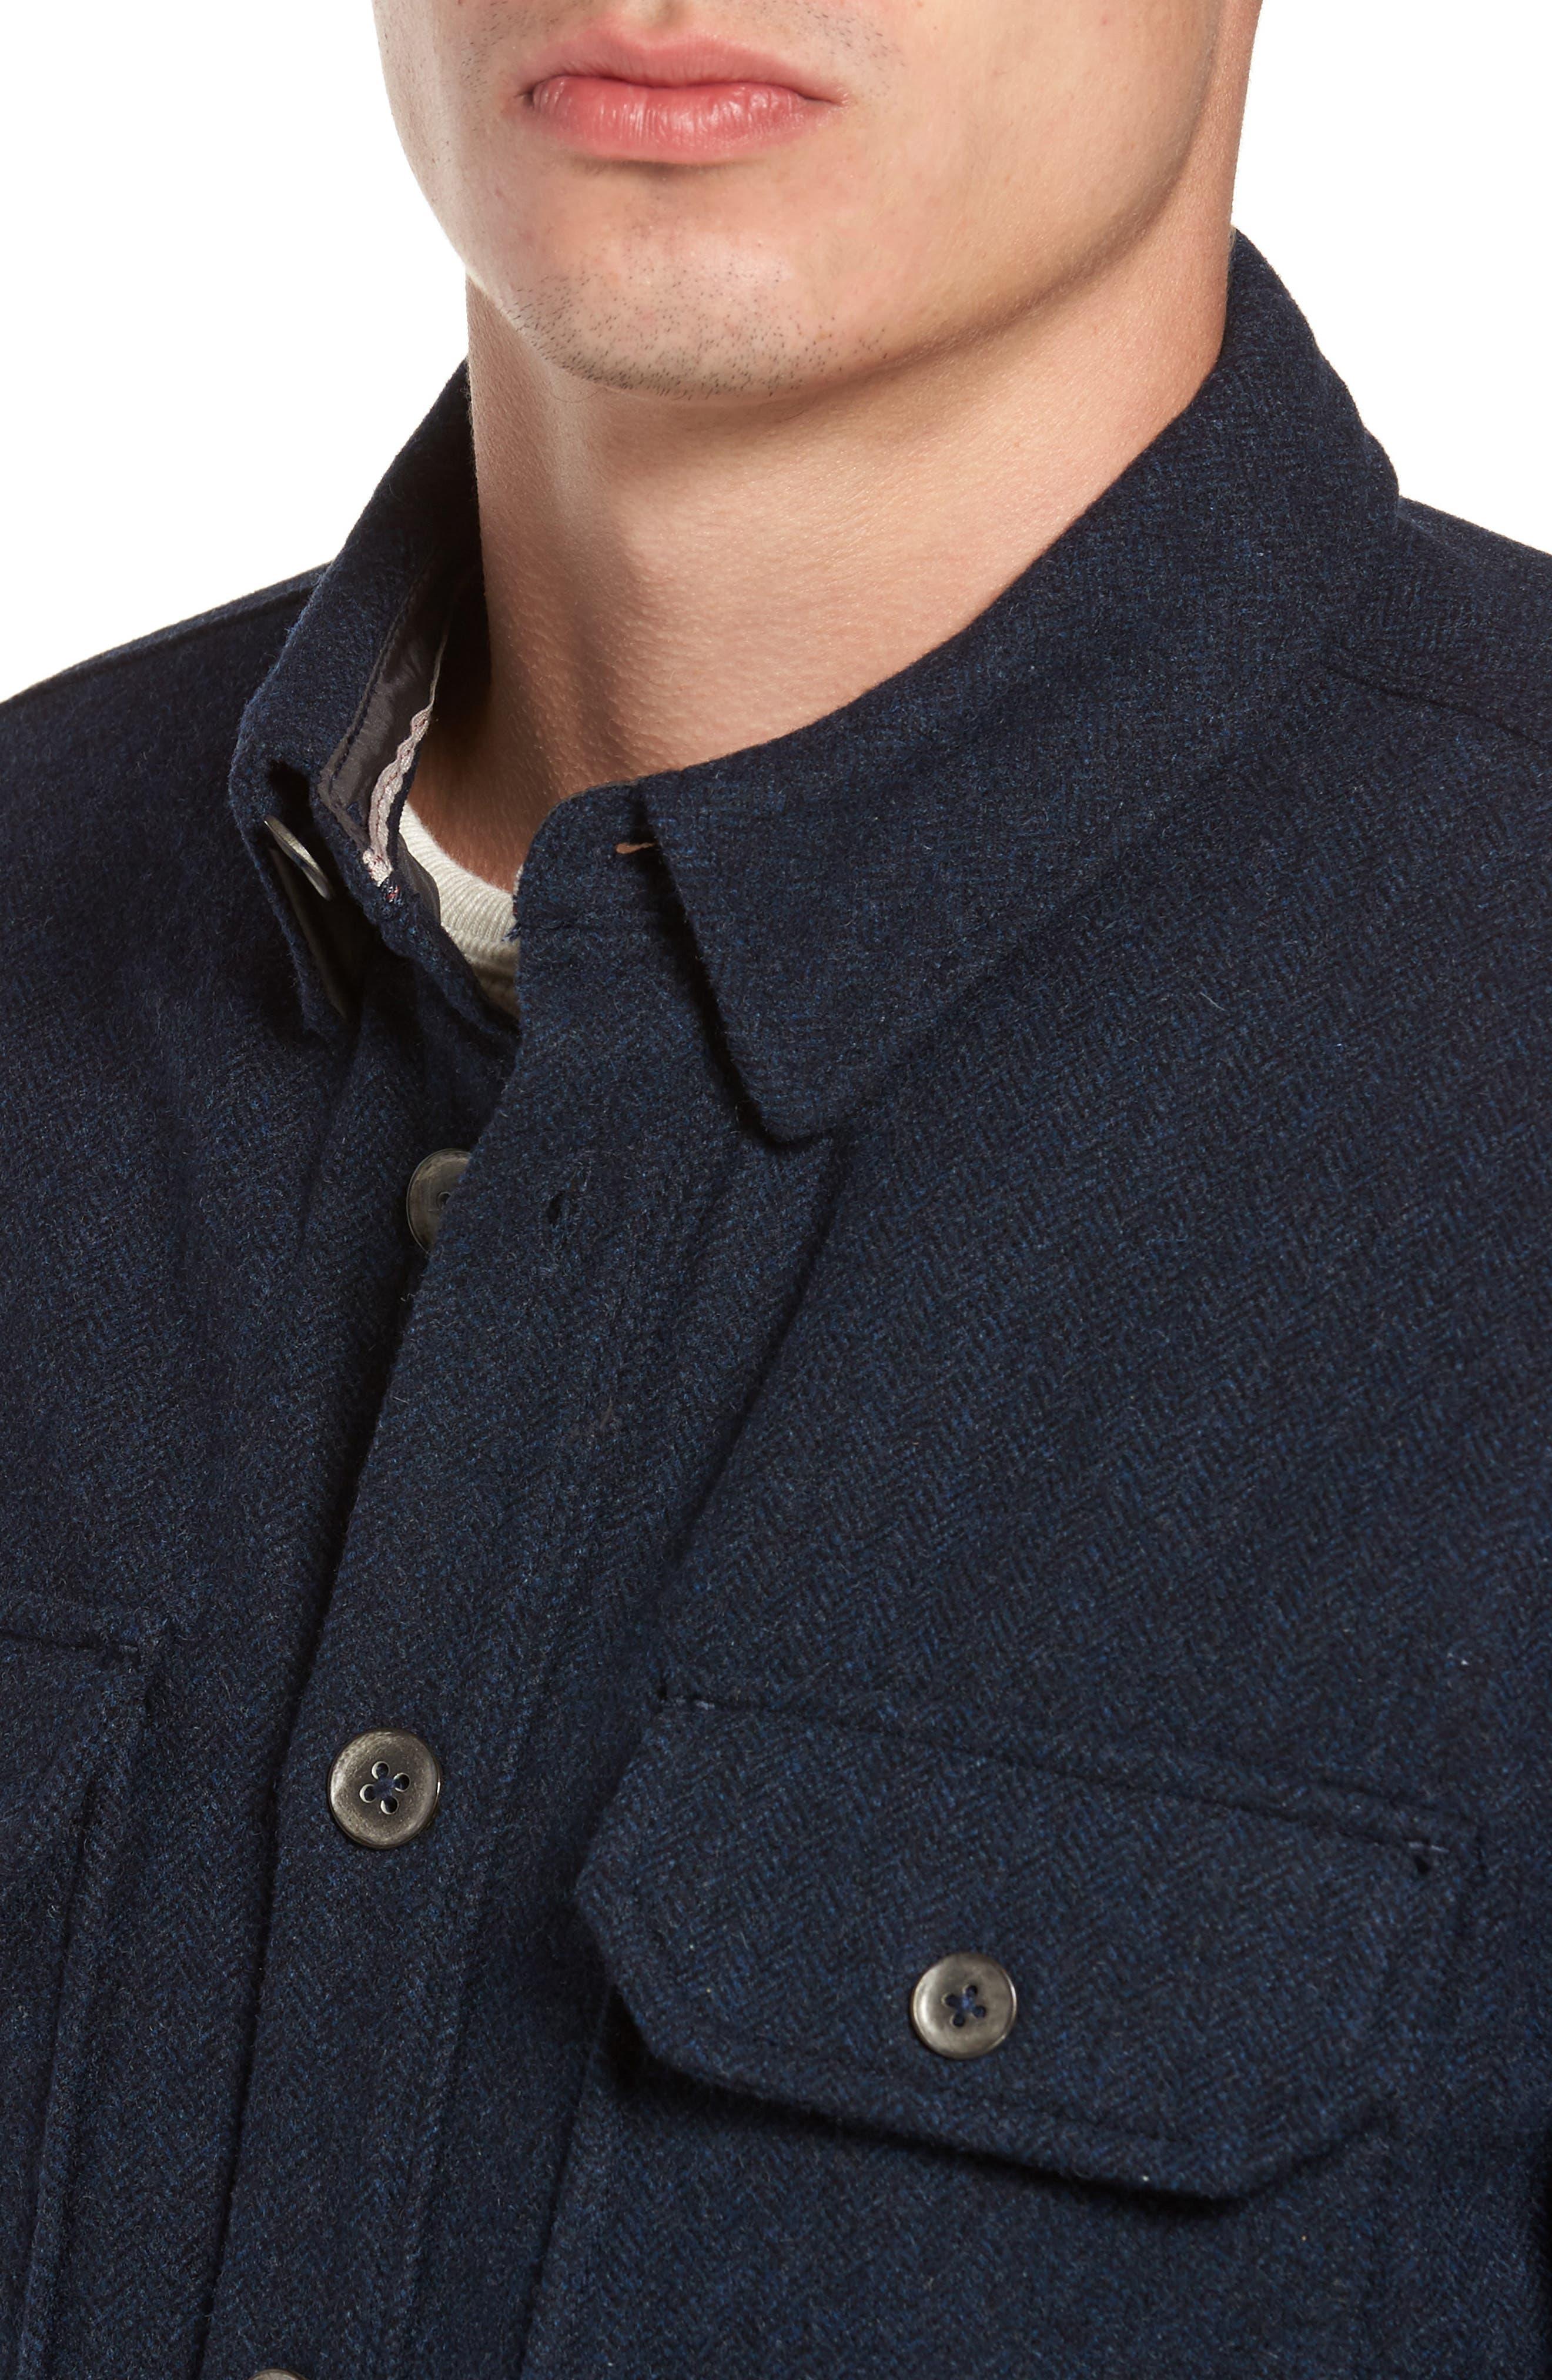 Creek Herringbone Wool Shirt Jacket,                             Alternate thumbnail 4, color,